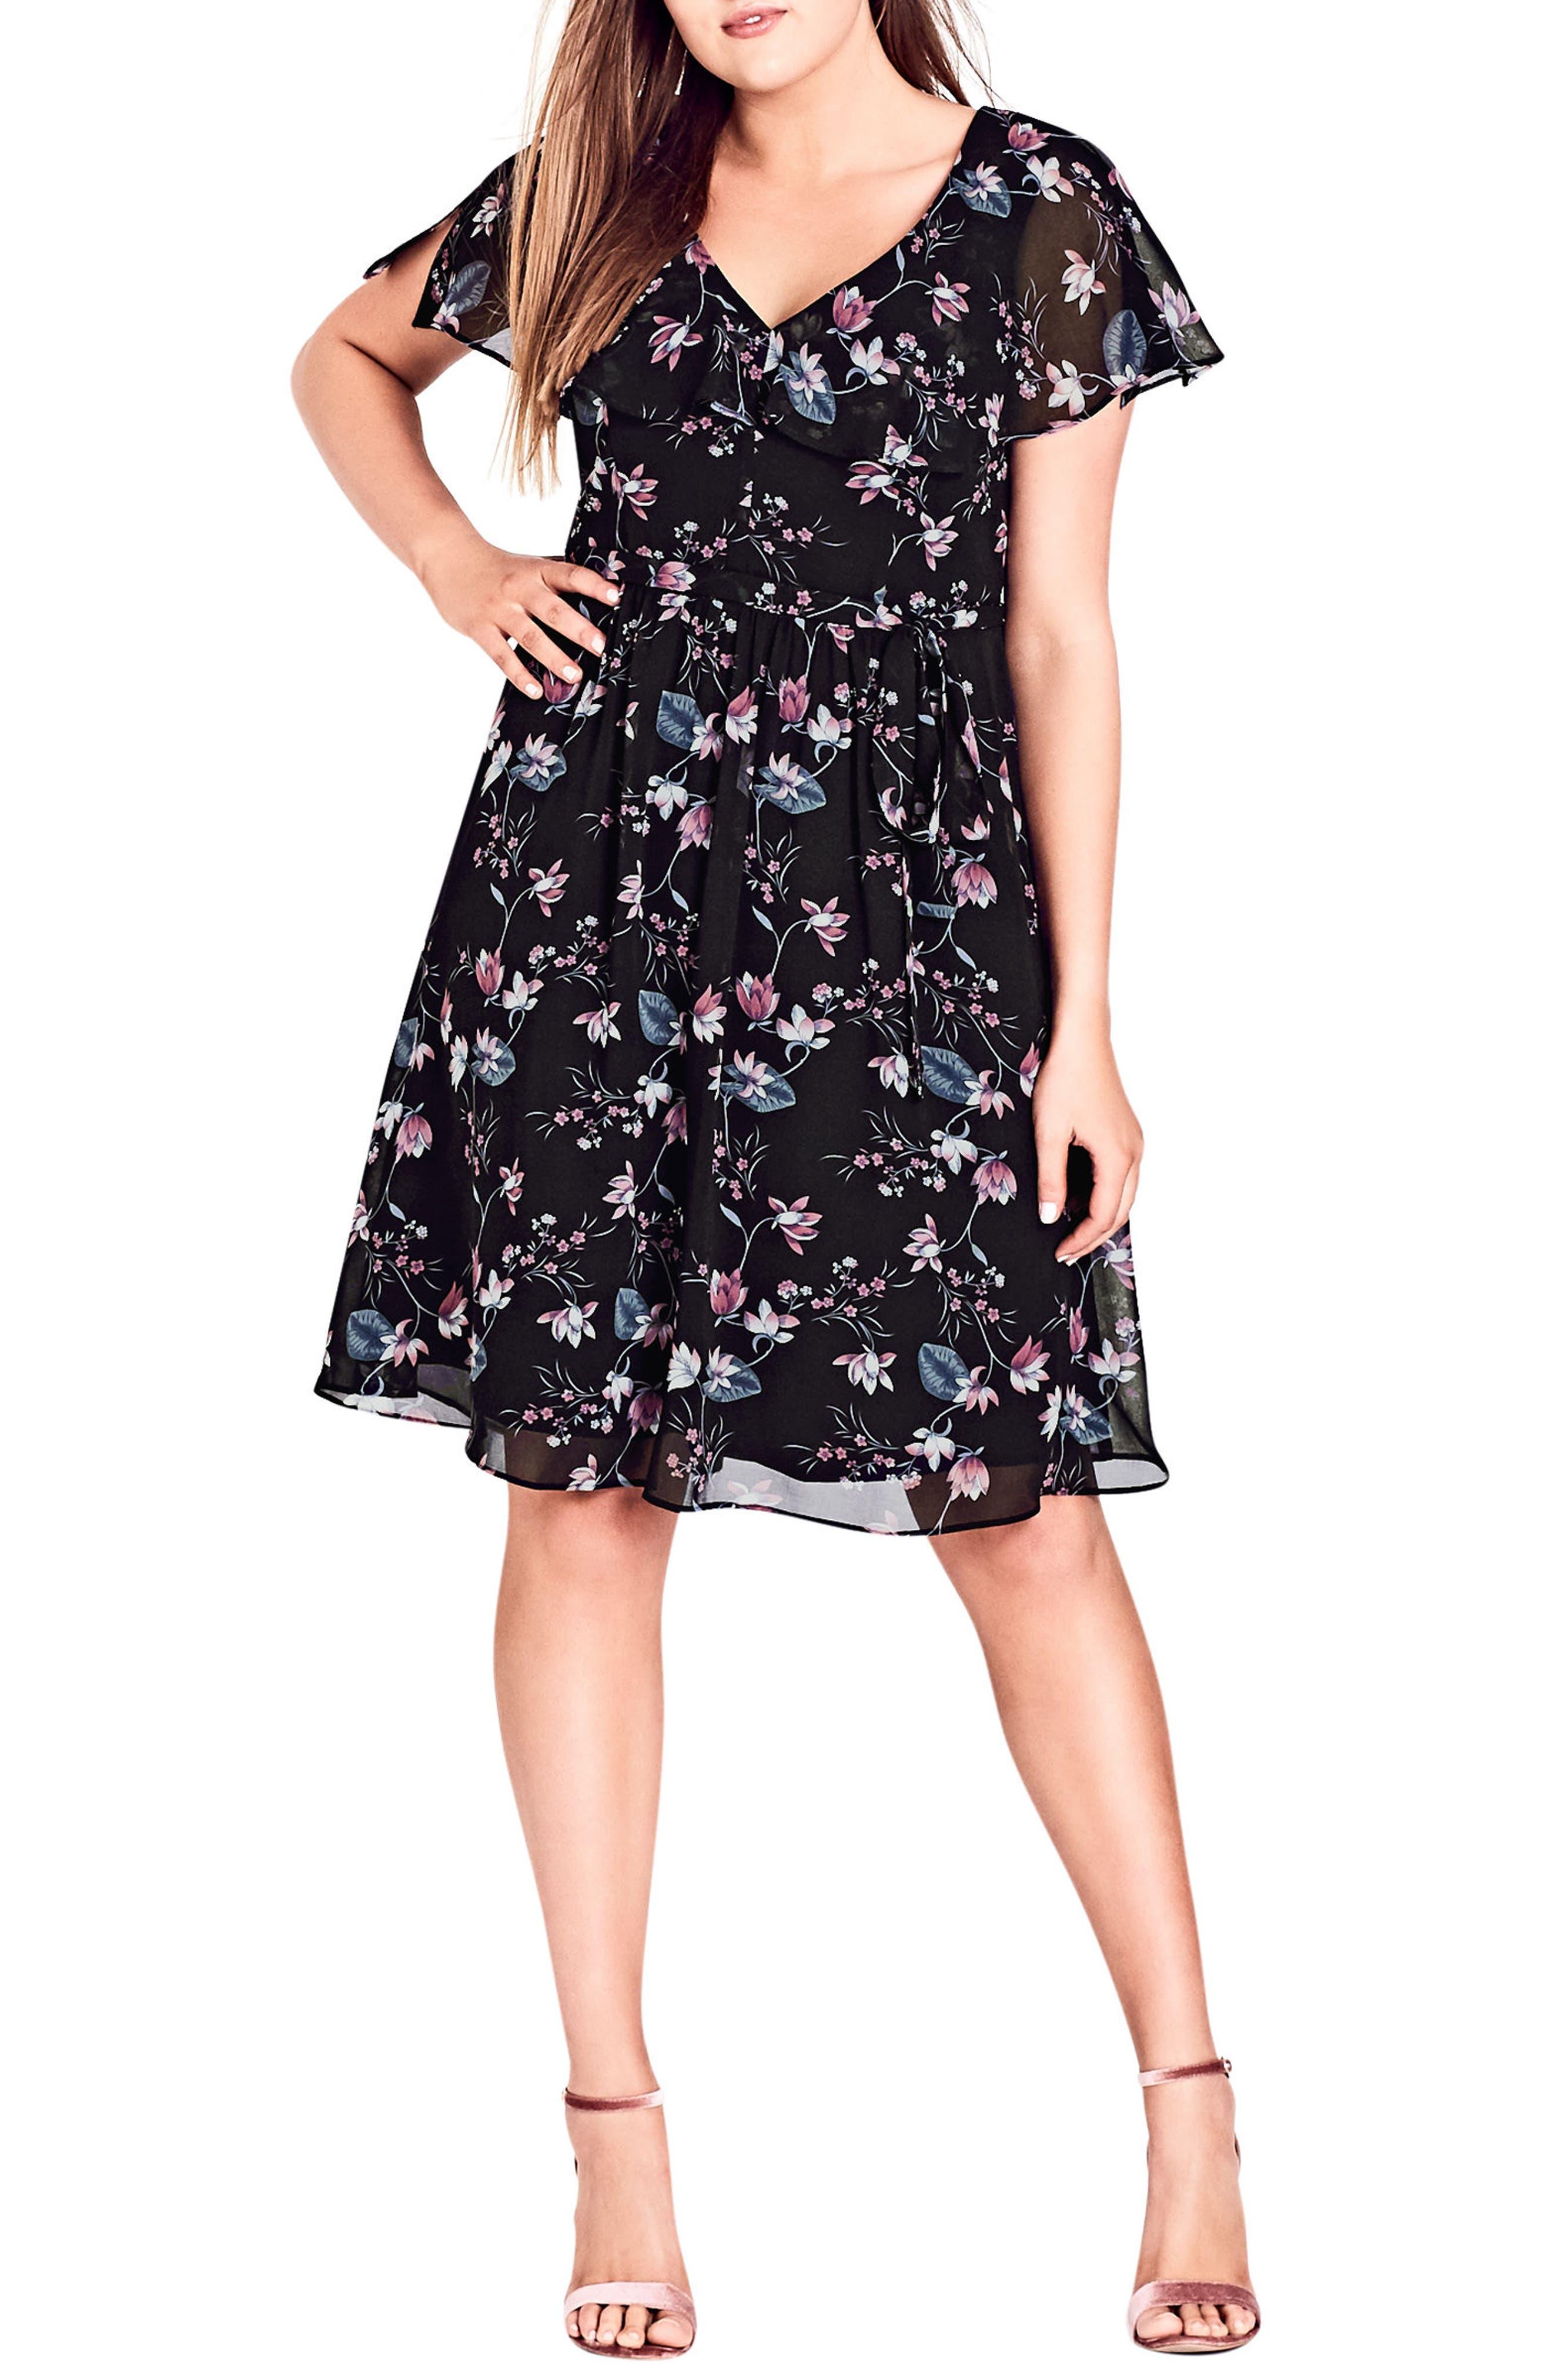 Alternate Image 1 Selected - City Chic Sweet Jasmine Fit & Flare Dress (Plus Size)